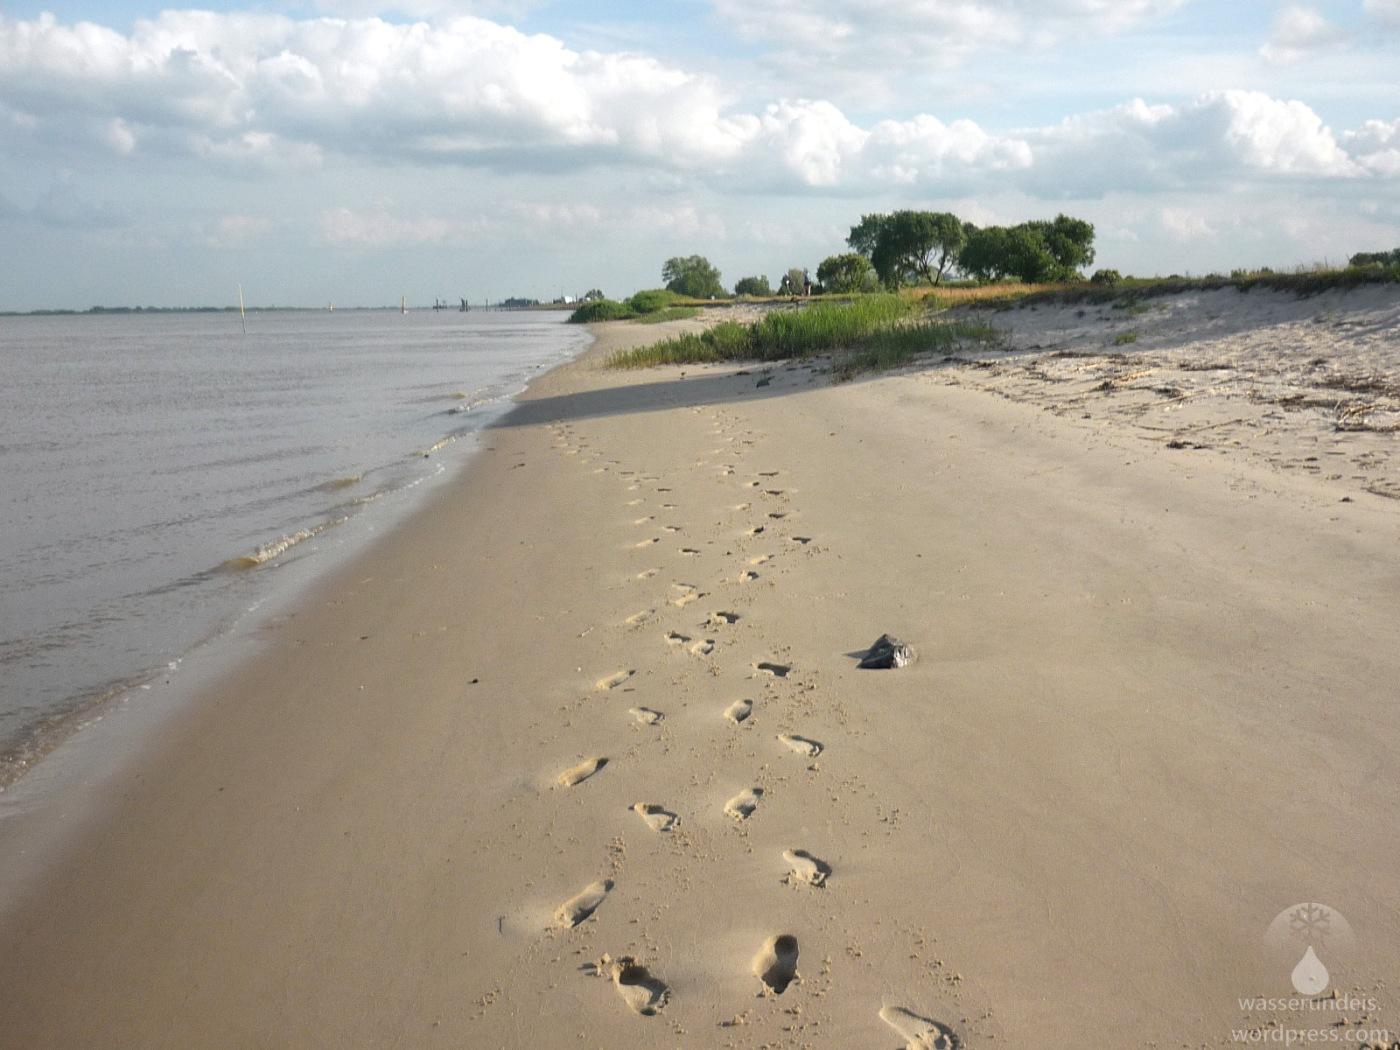 Weserstrand in Kleinensiel.